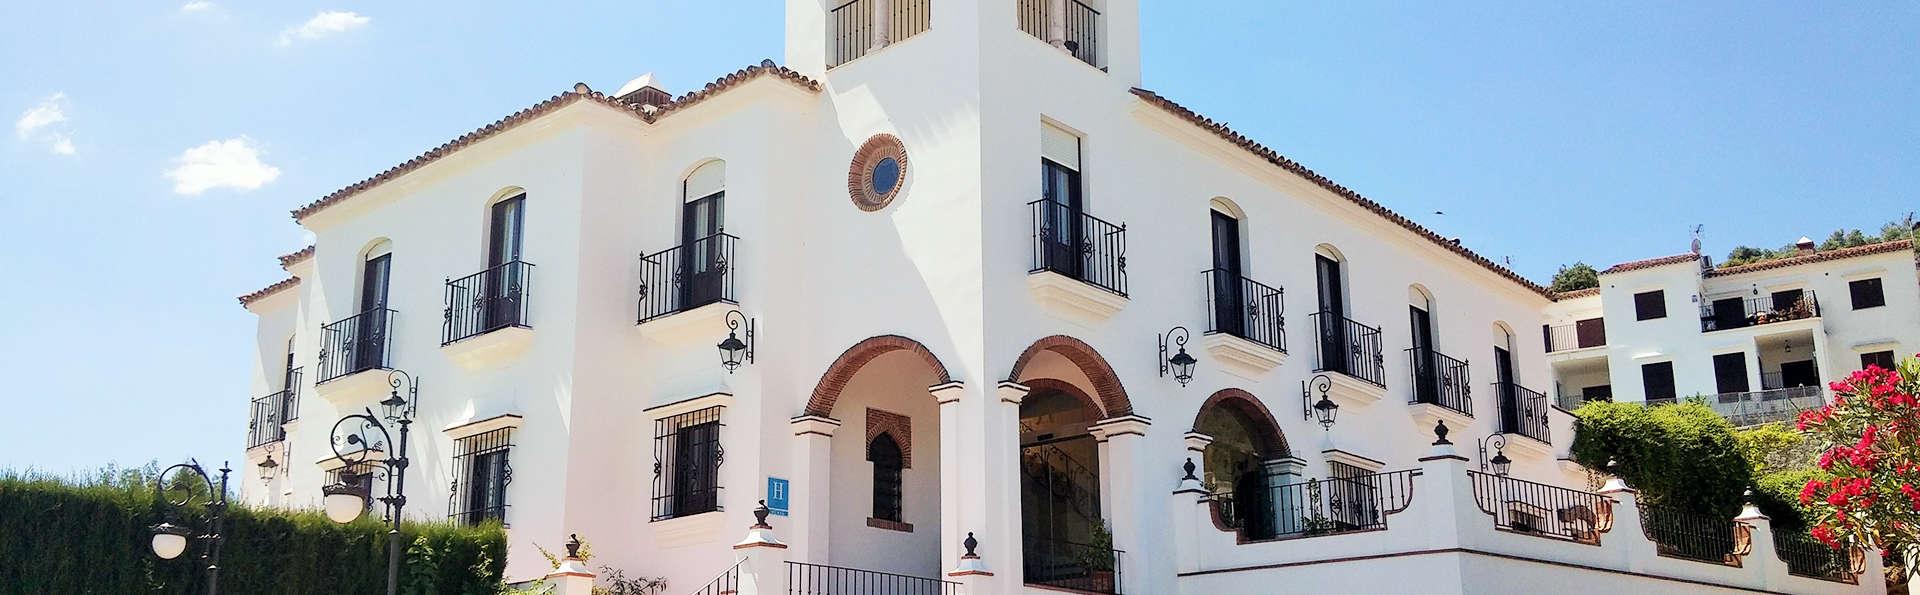 Hotel Vega de Cazalla - EDIT_front1.jpg